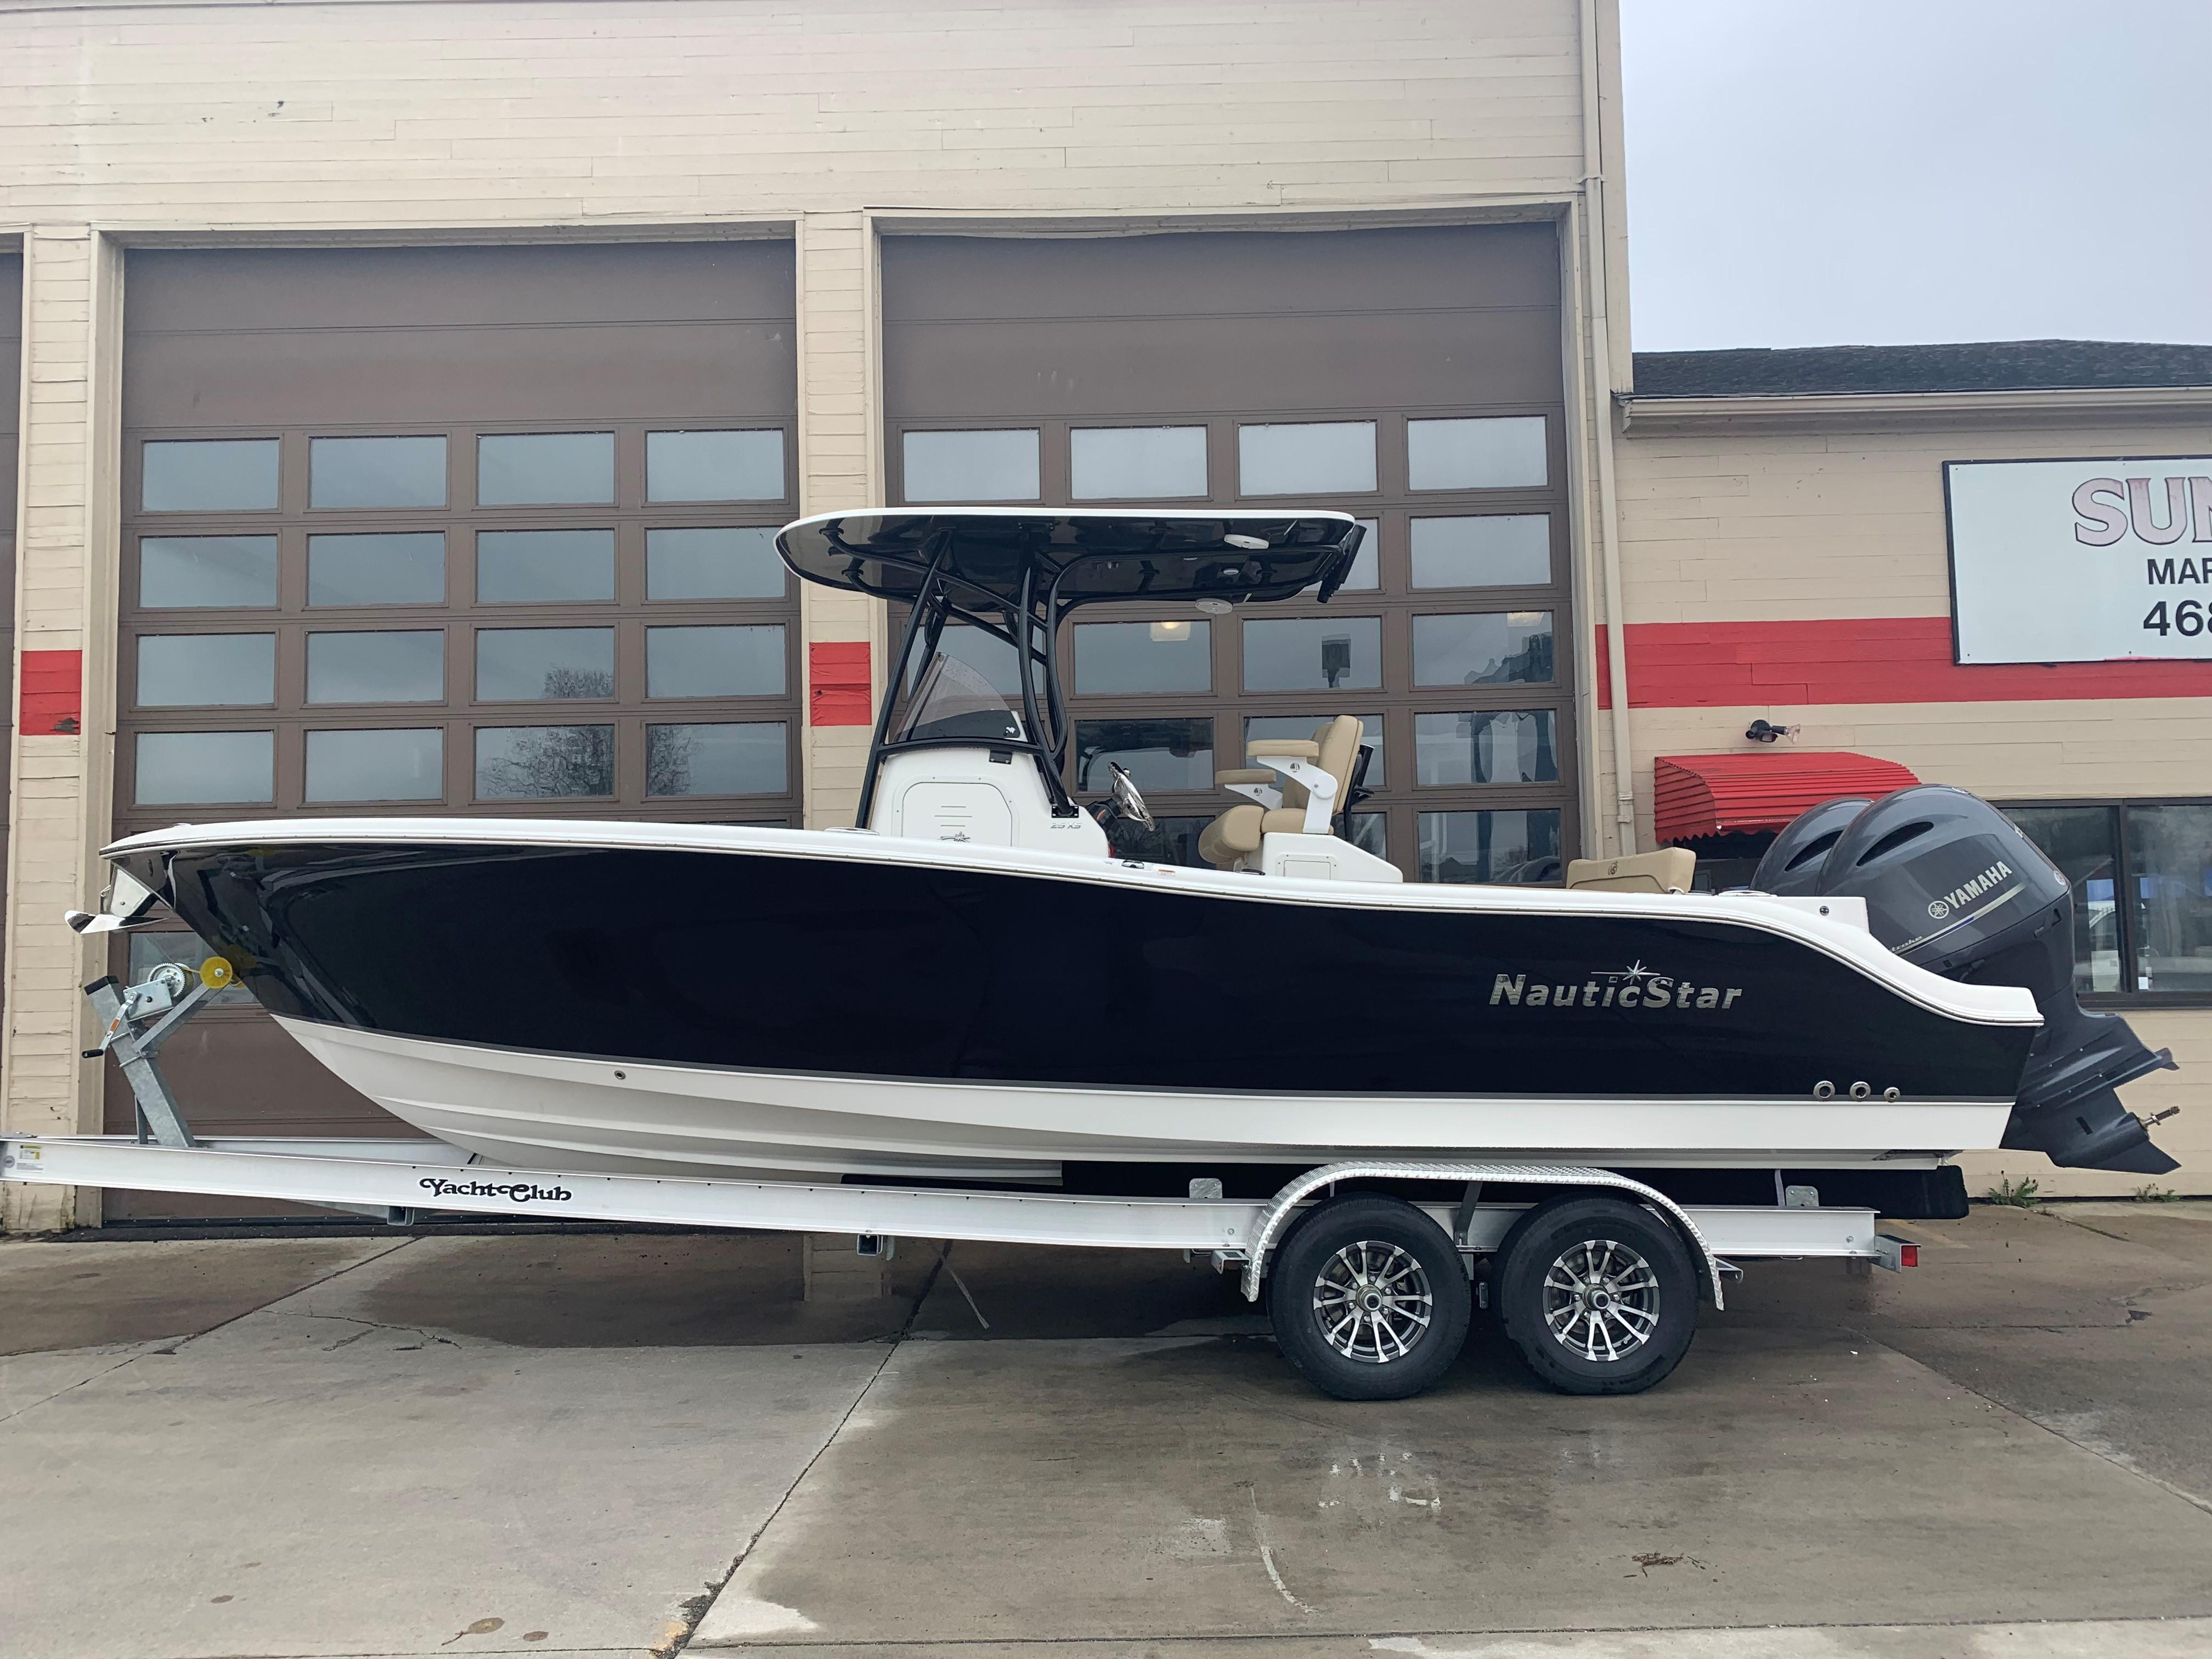 NauticStar25 XS Offshore